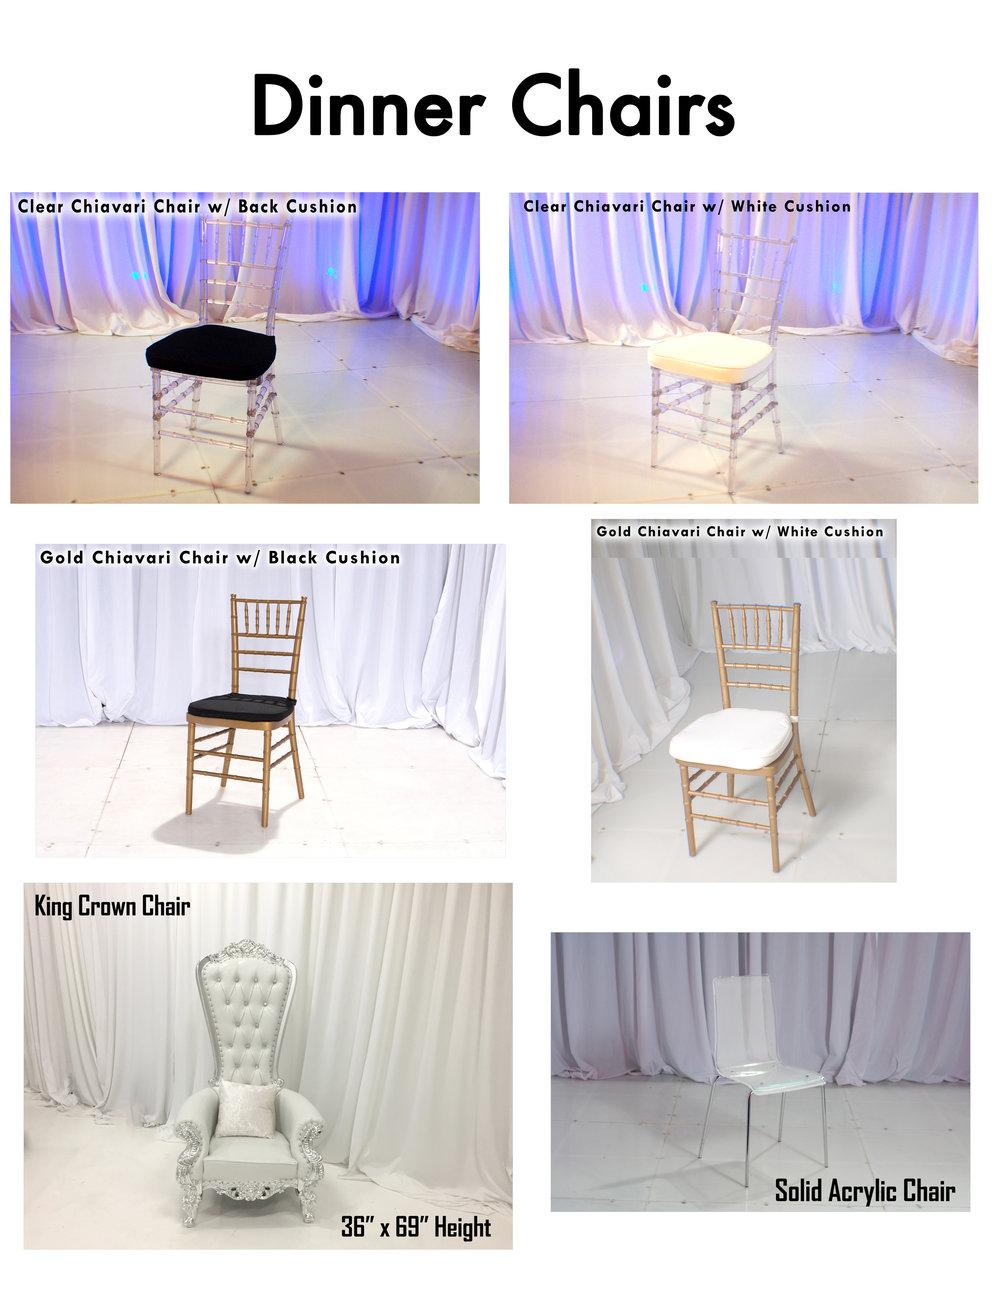 046-P45_Dinner Chairs.jpg